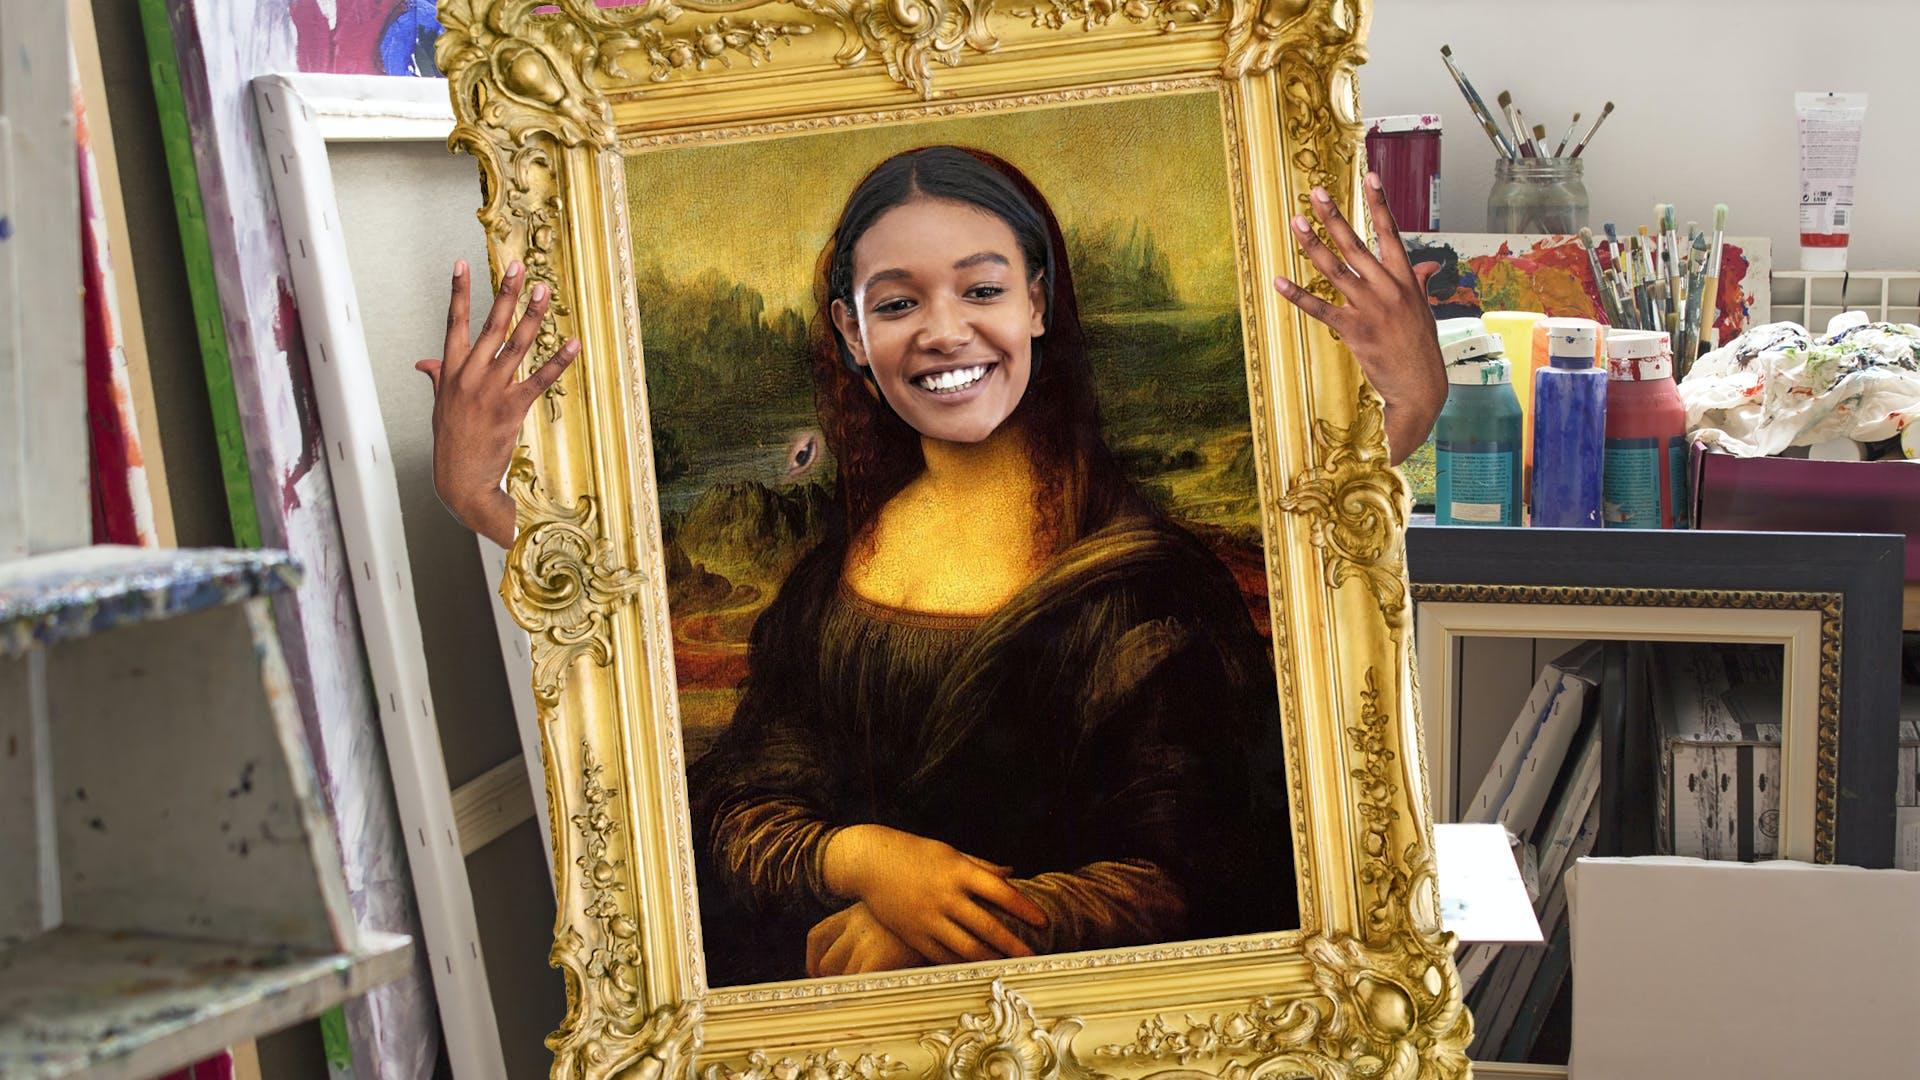 Art teacher dressed as the Mona Lisa